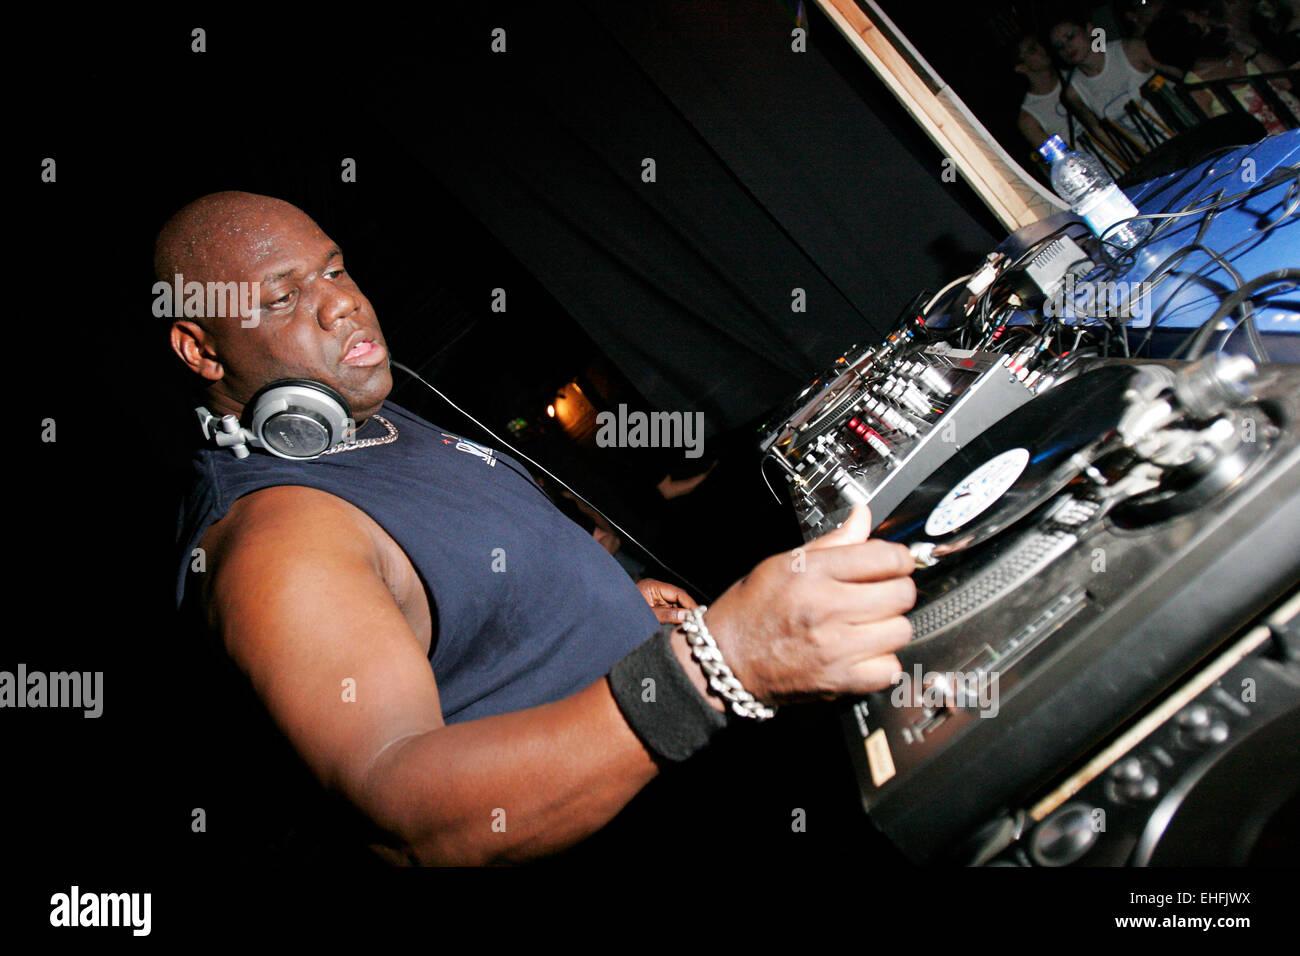 Carl Cox DJing at Heaven London. - Stock Image